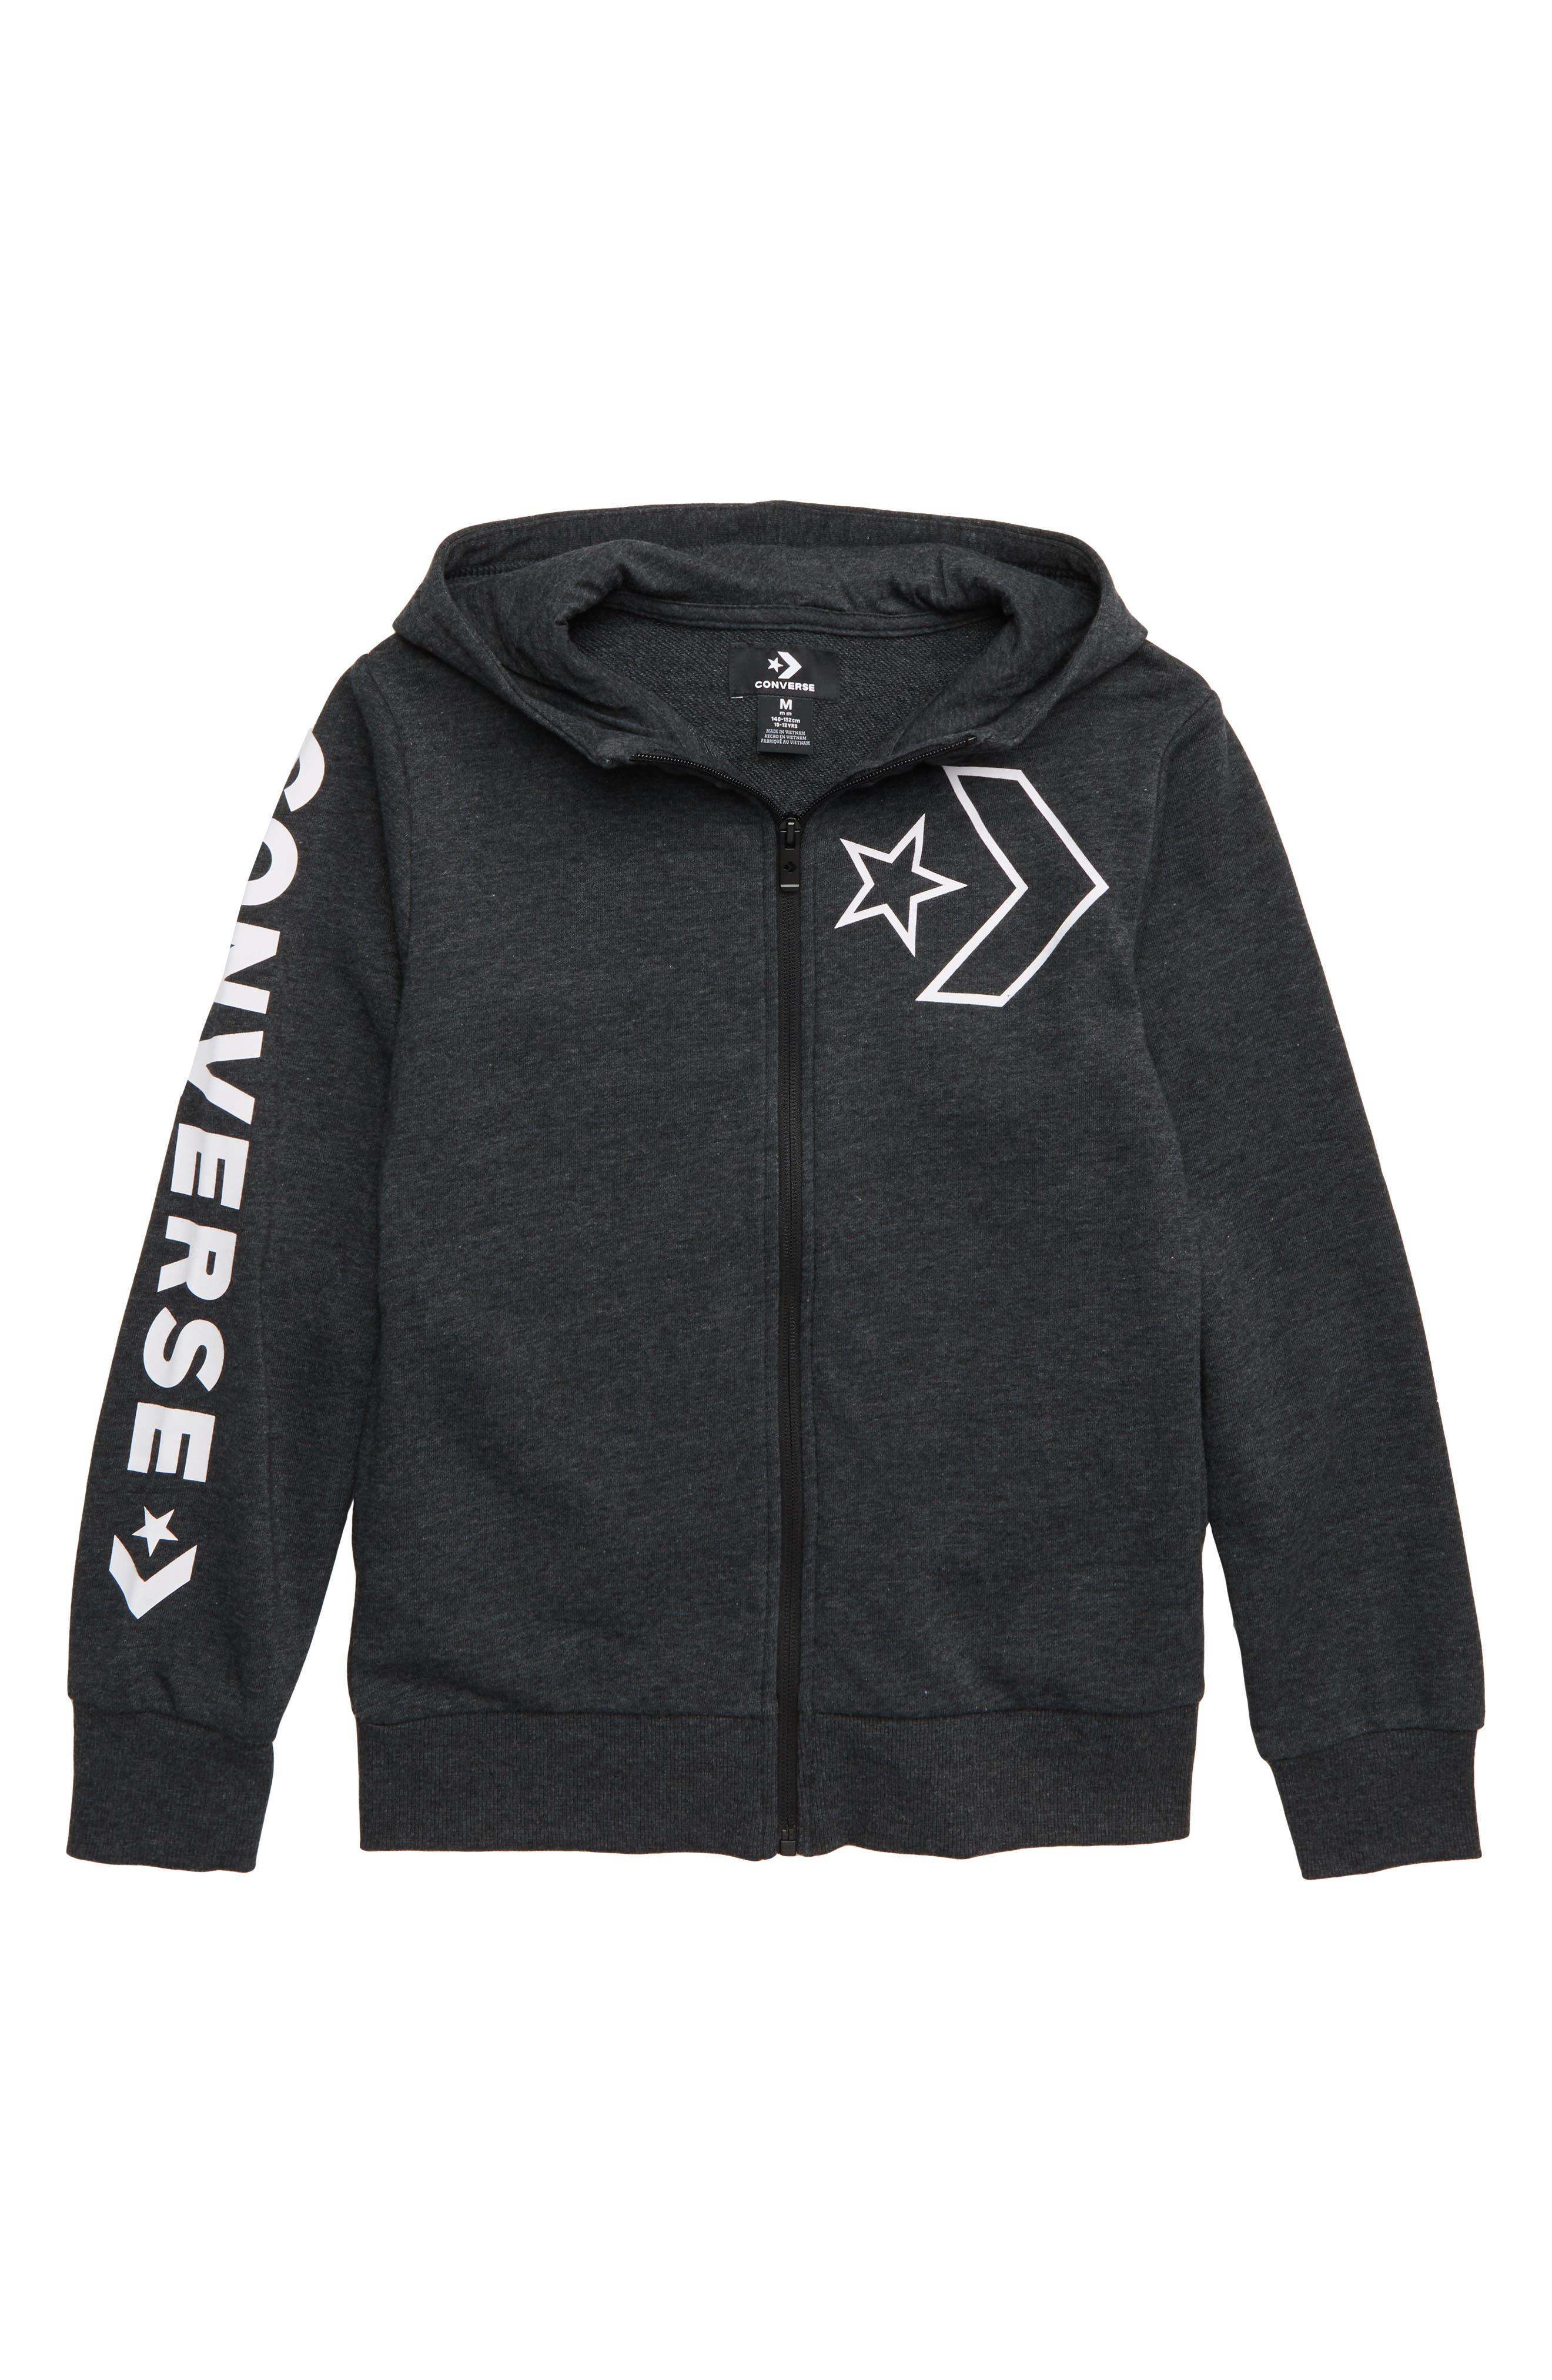 Boys Converse Star Chevron Outline Logo Zip Hoodie Size XL (1315y)  Blue